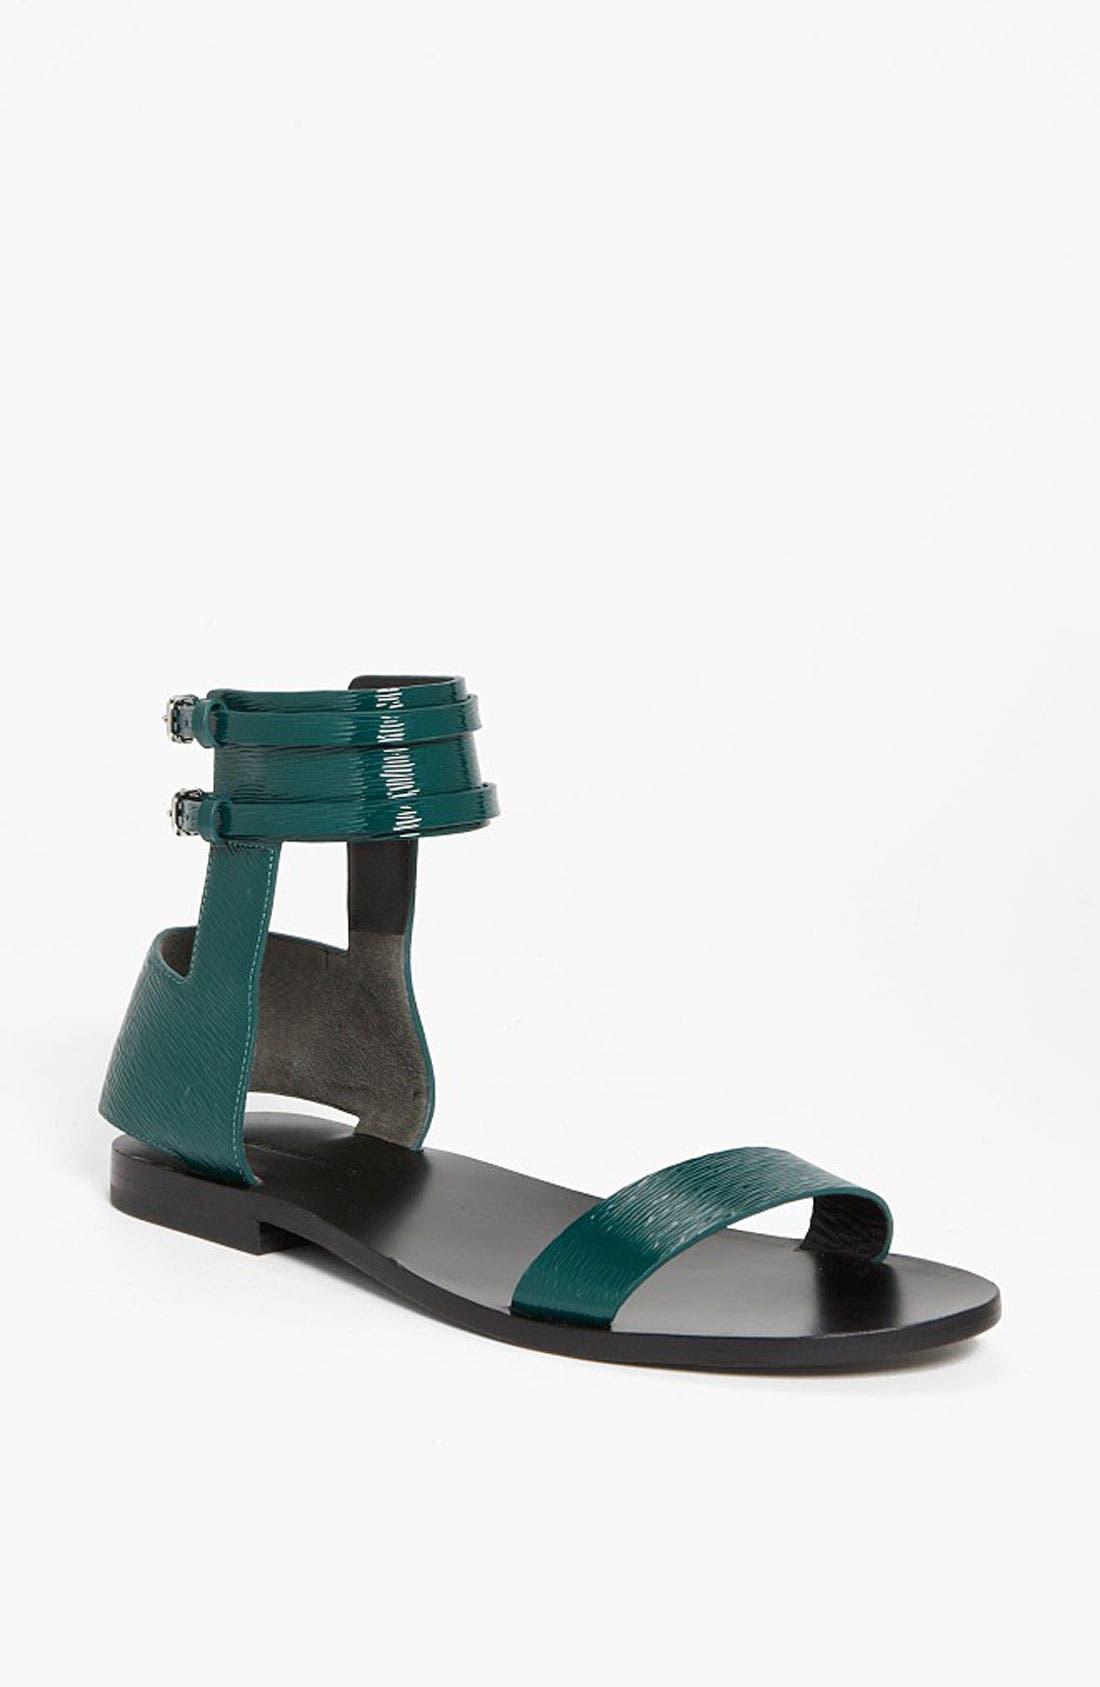 Alternate Image 1 Selected - Alexander Wang 'Alek' Sandal